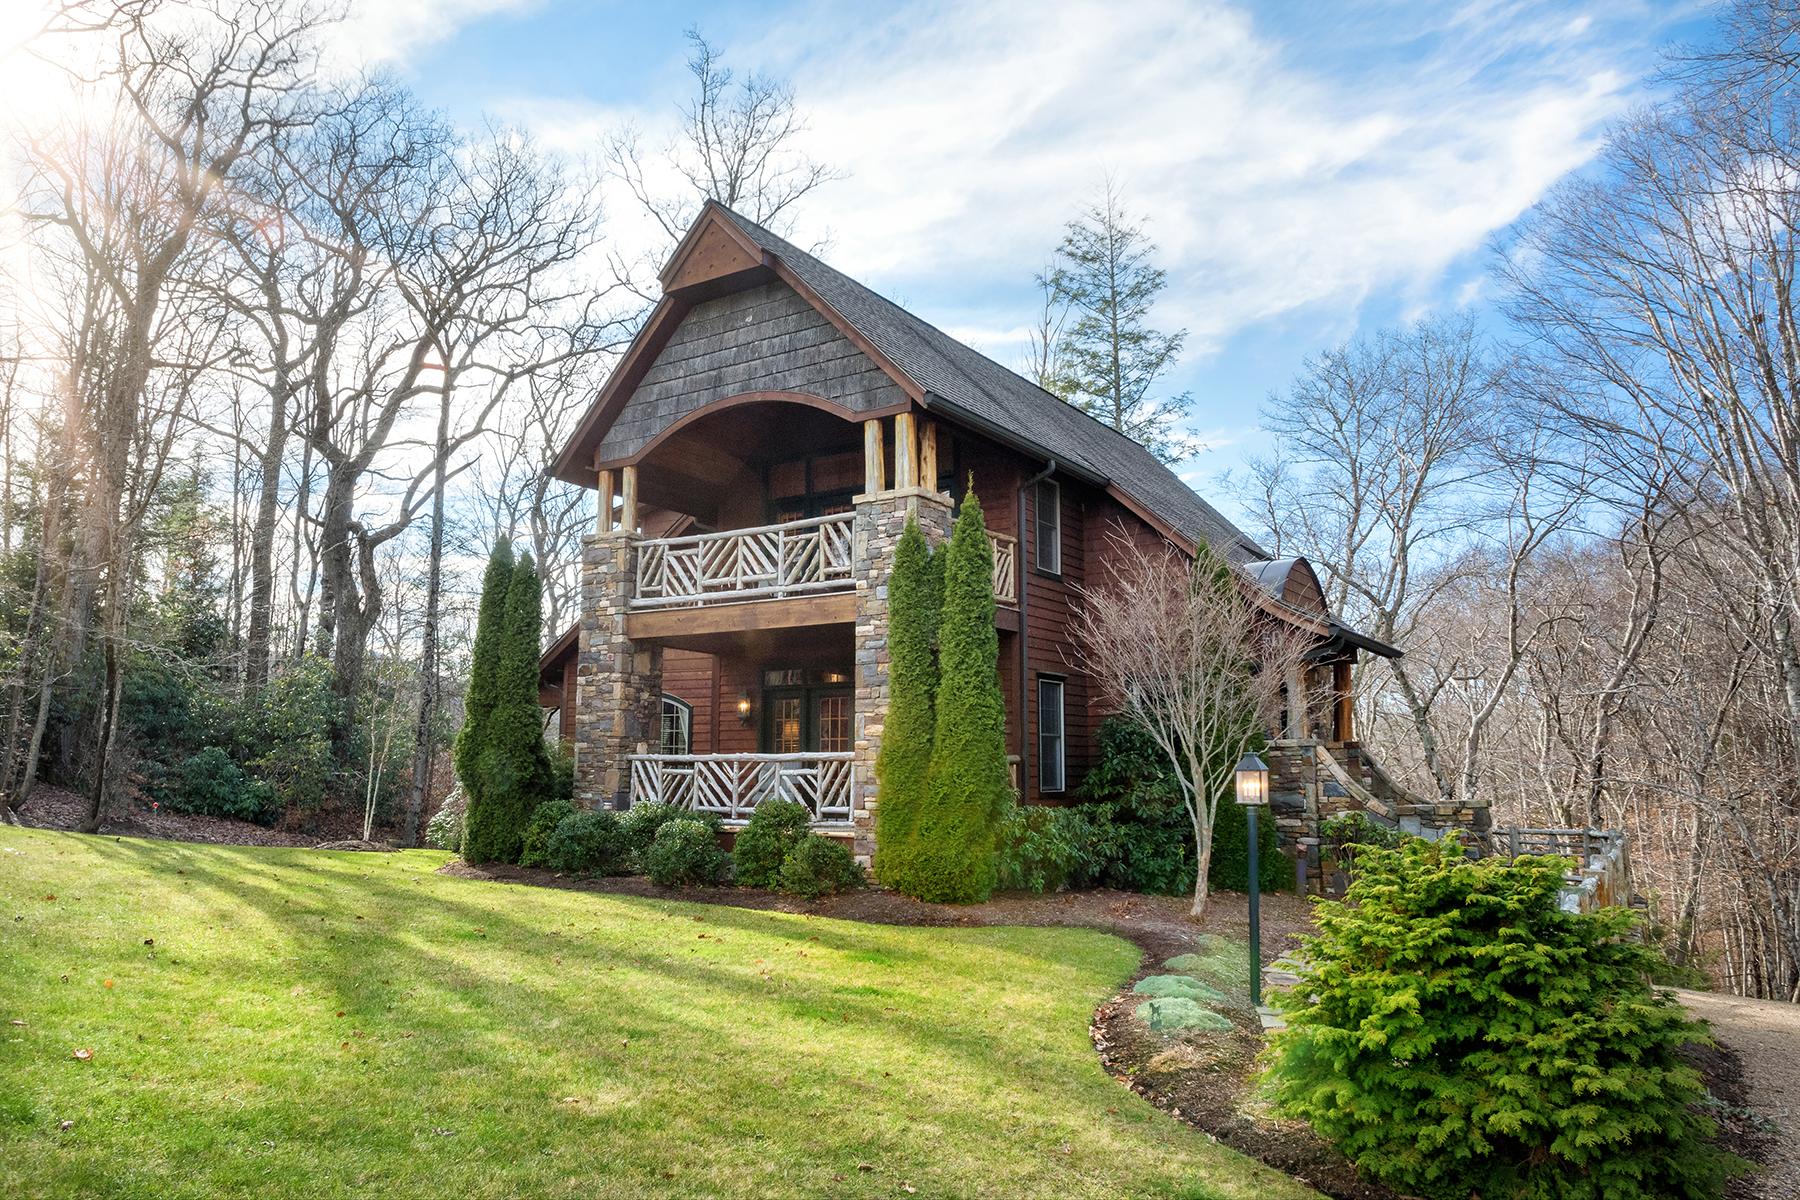 Single Family Home for Sale at BANNER ELK - THE FARM AT BANNER ELK 50 Hanging Rock Knoll Place Banner Elk, North Carolina, 28604 United States